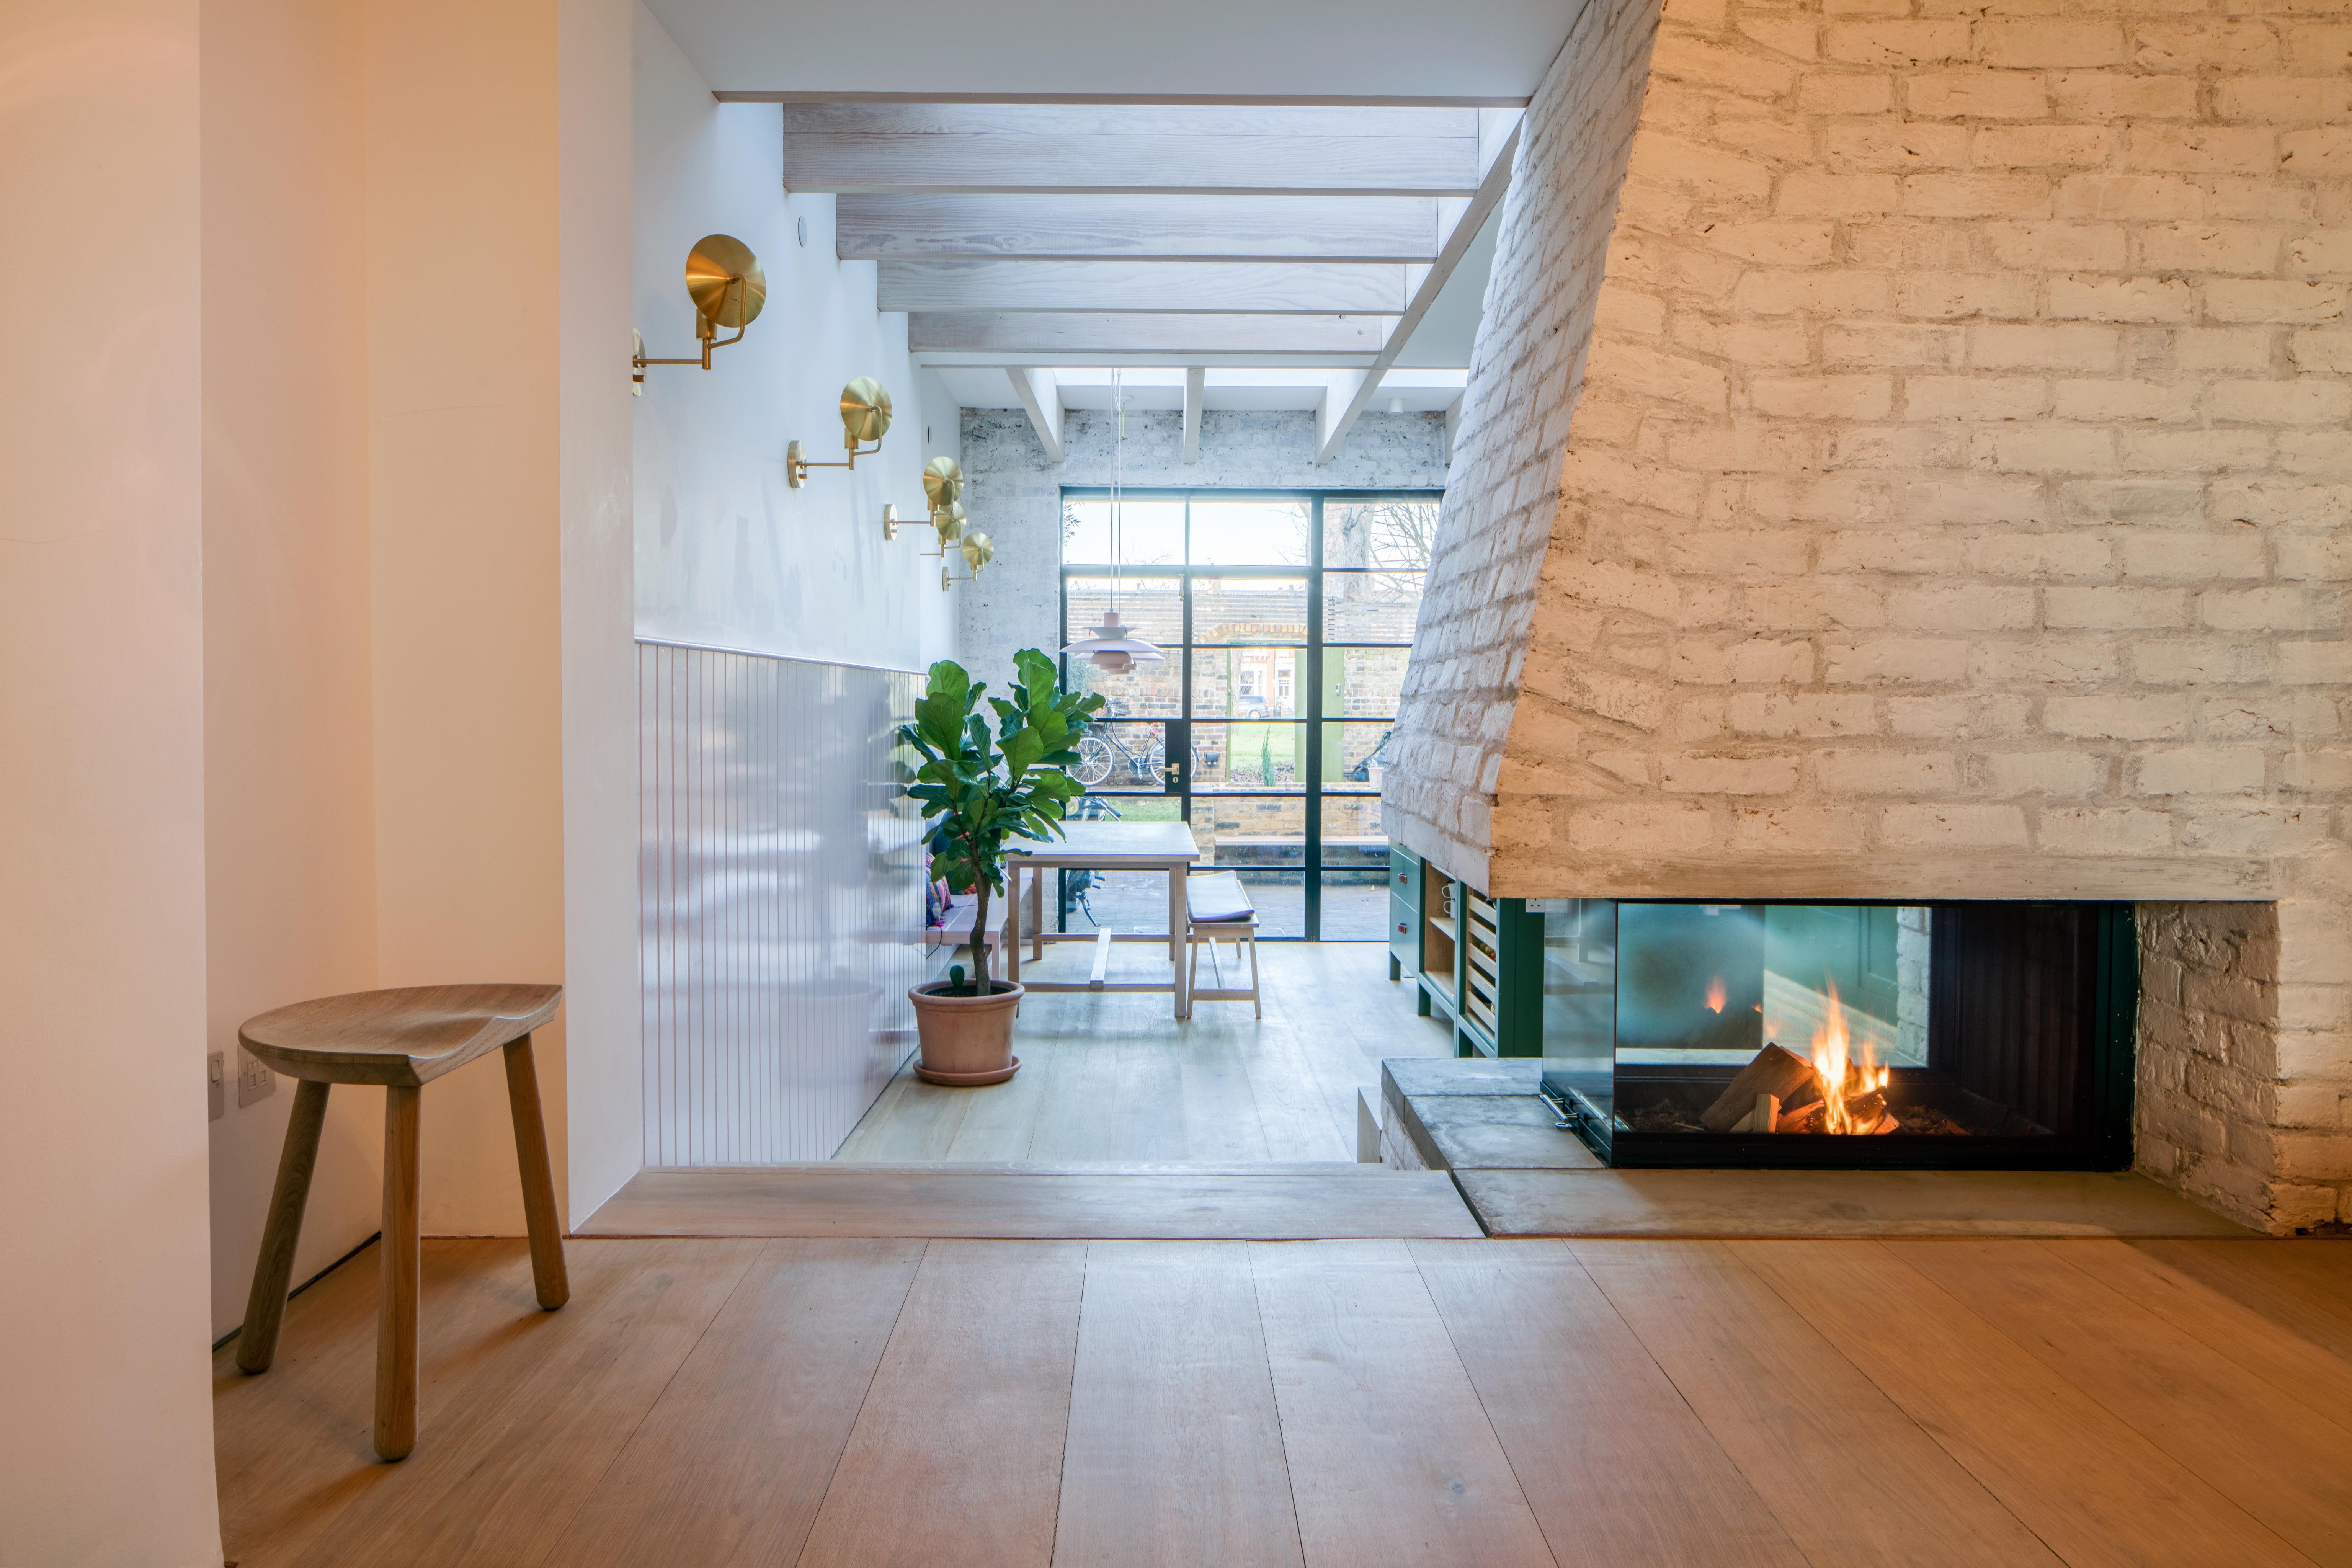 Mike Tuck Groombridge Kitchen Miketuckstudio Fireplace